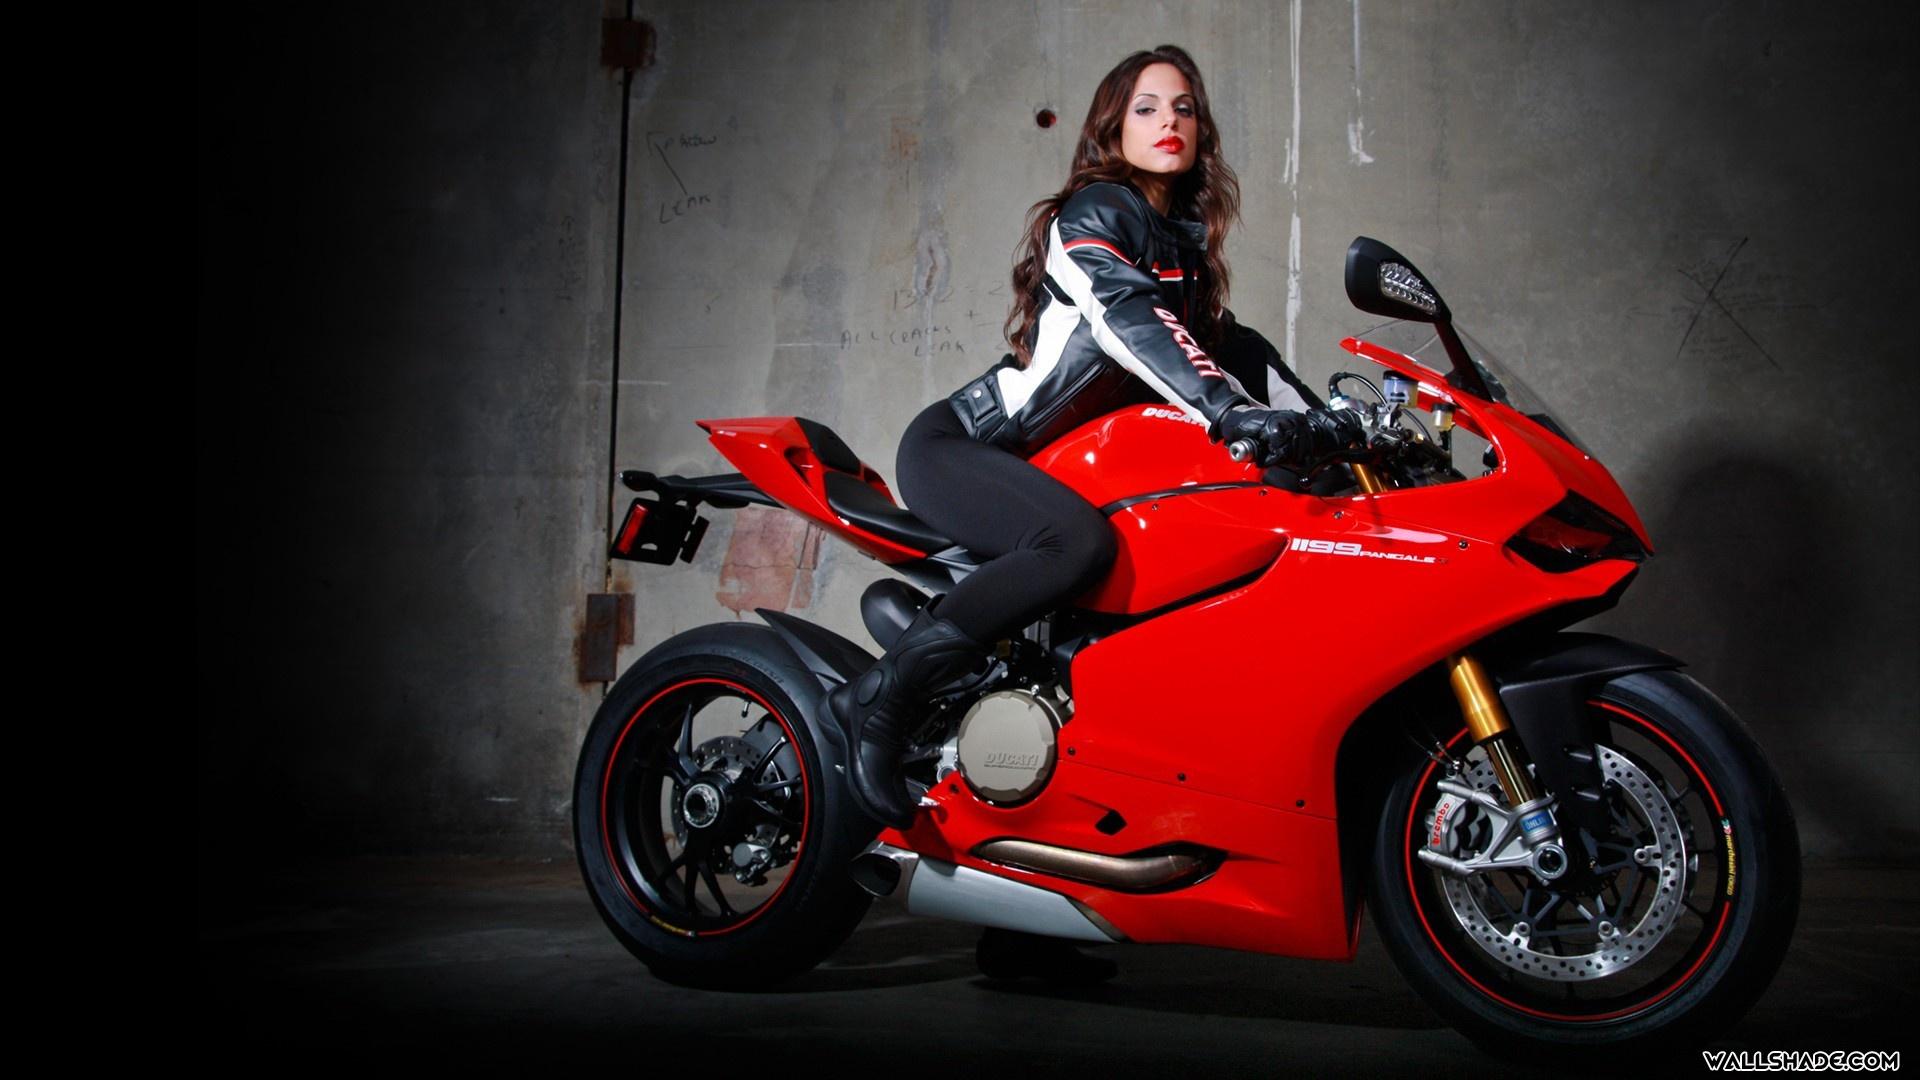 Ducati 1199 panigale #1